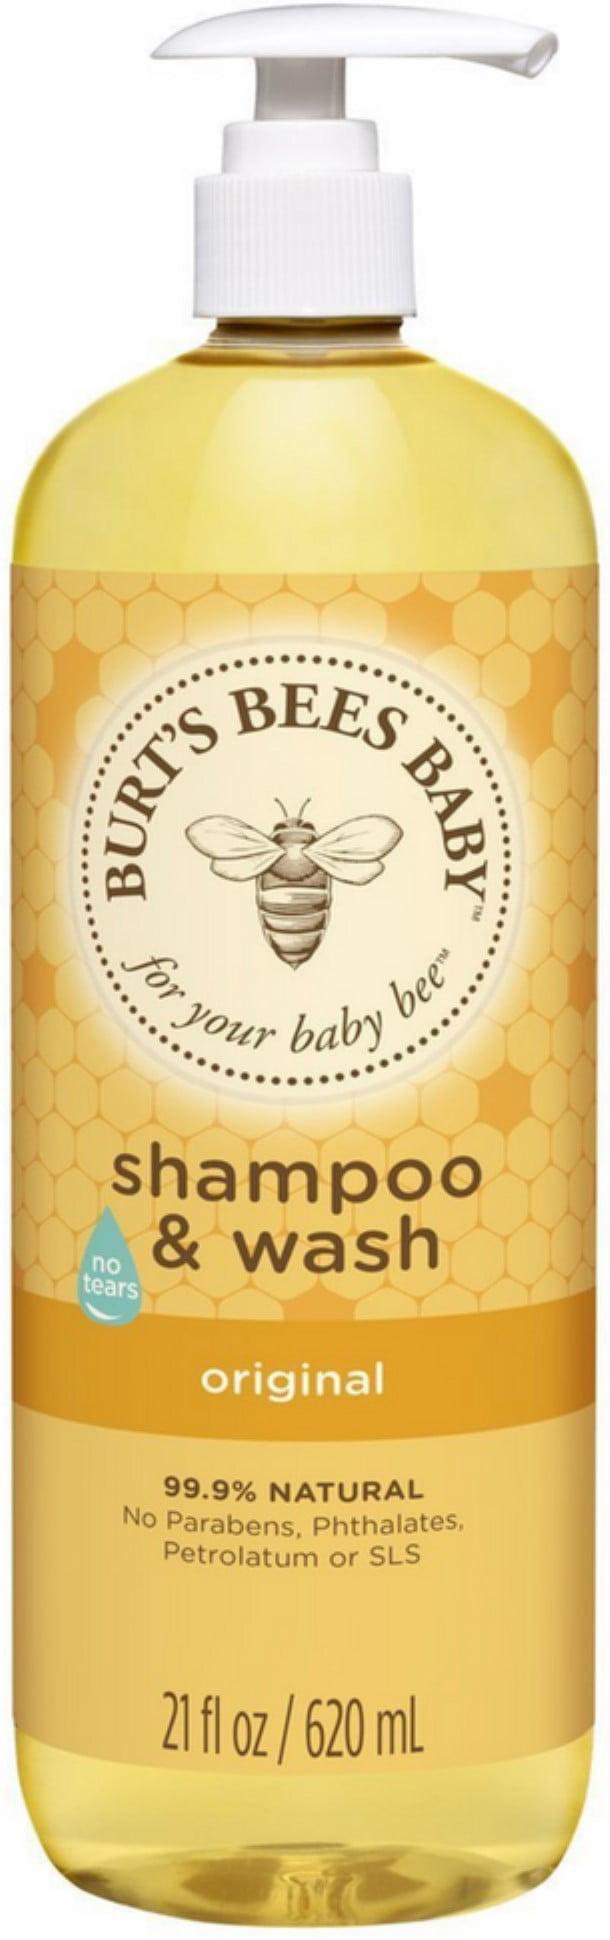 6 Pack Burt's Bees Baby Shampoo & Wash, Original 21 oz by